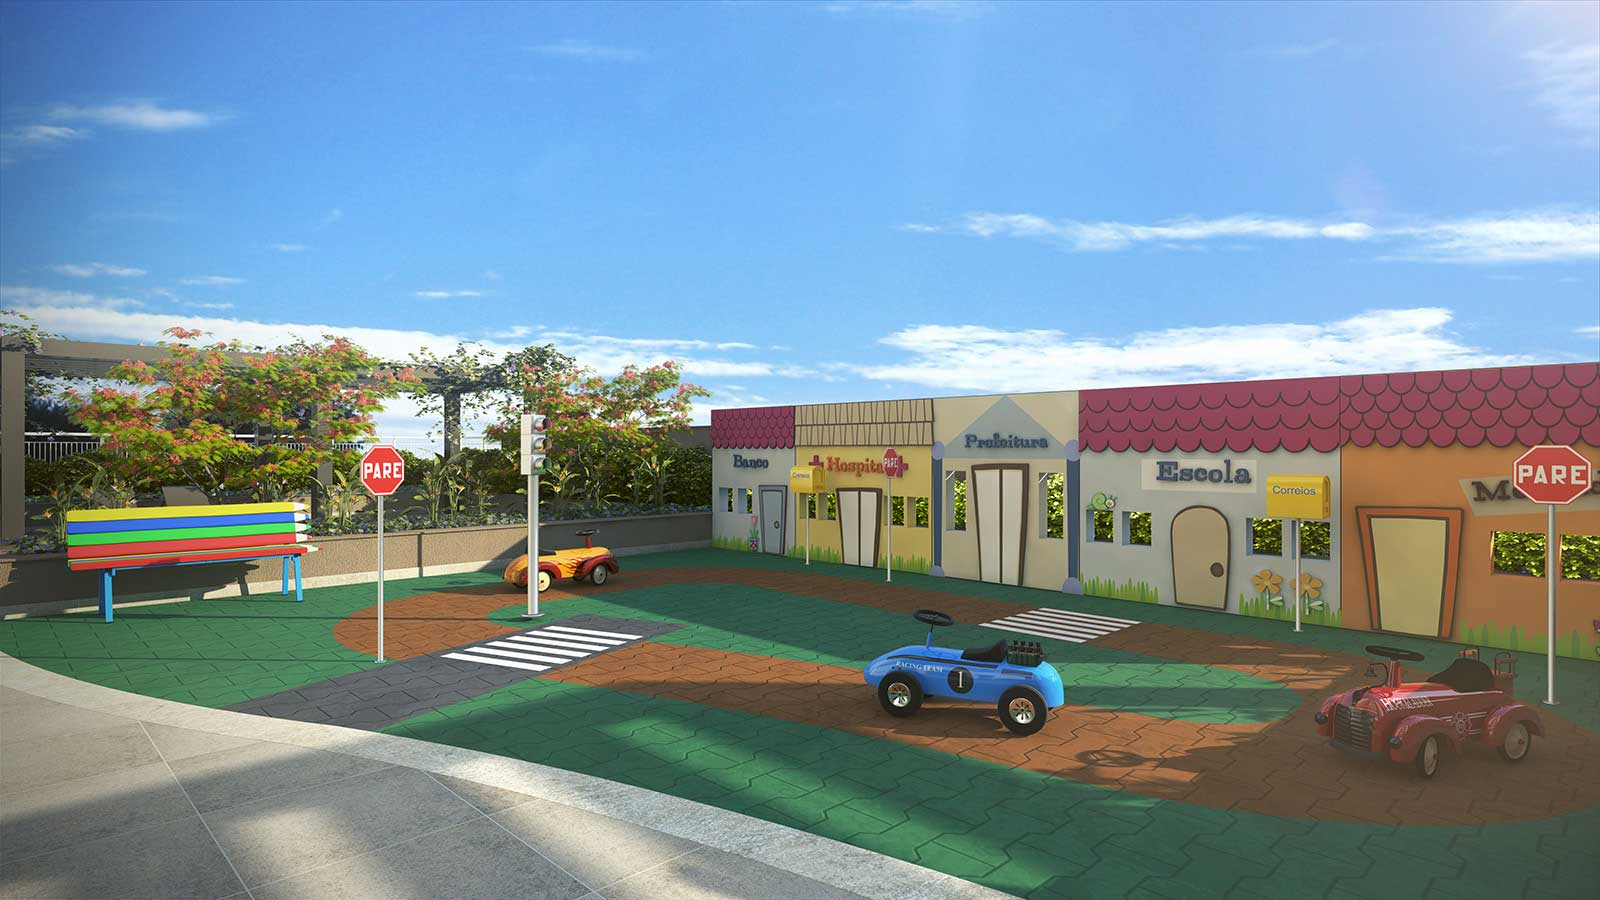 perspectiva-artistica-do-play-cidade